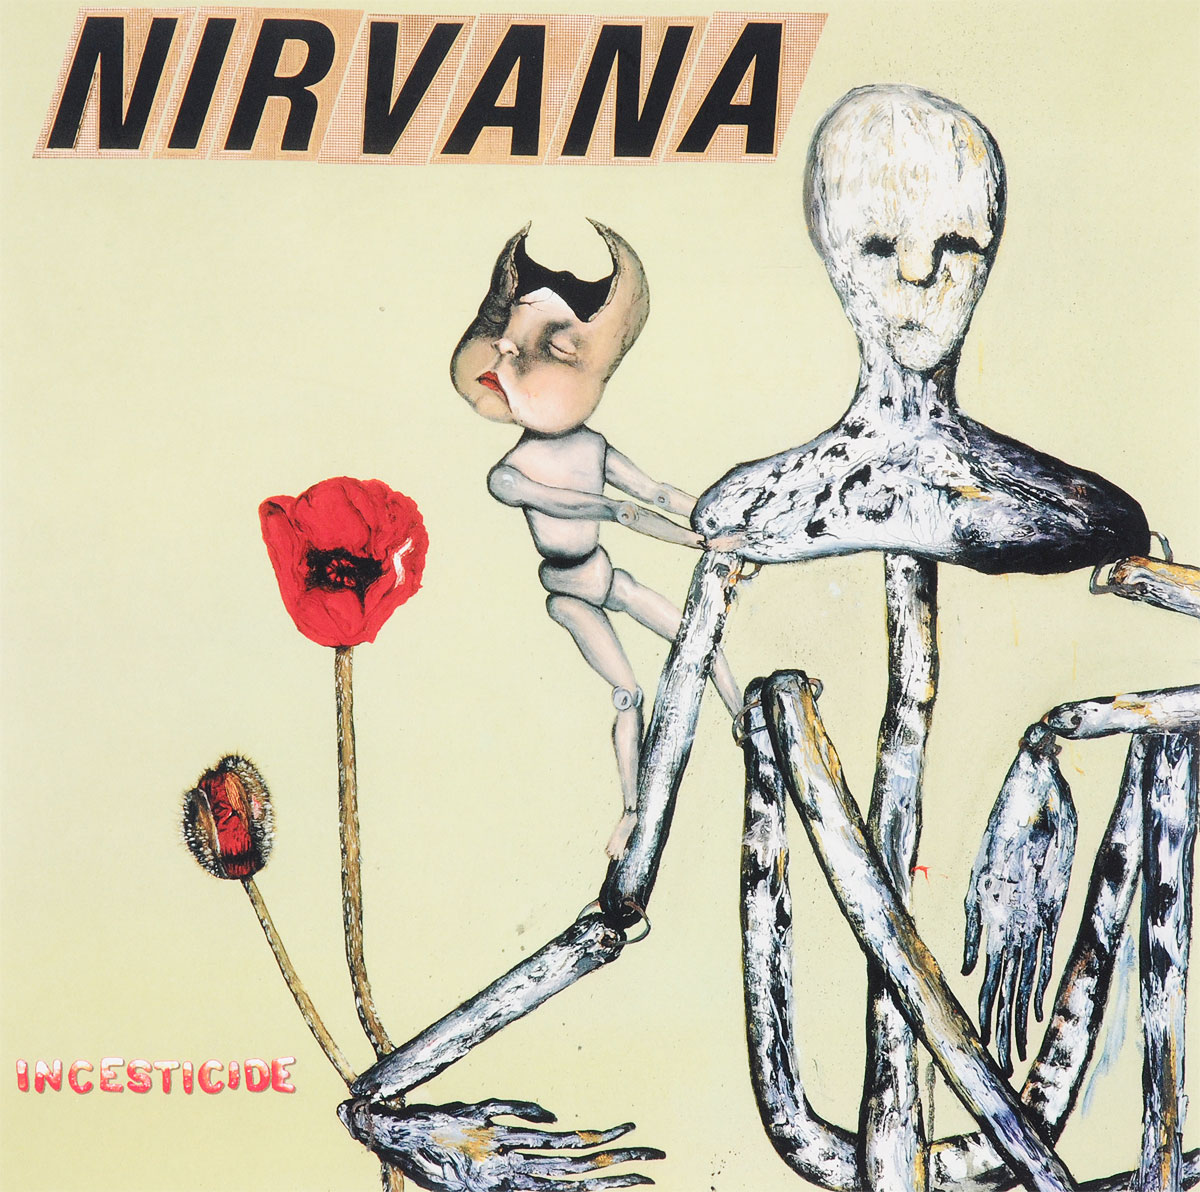 Nirvana Nirvana. Incesticide (2 LP) nirvana nirvana live at the paramount 2 lp